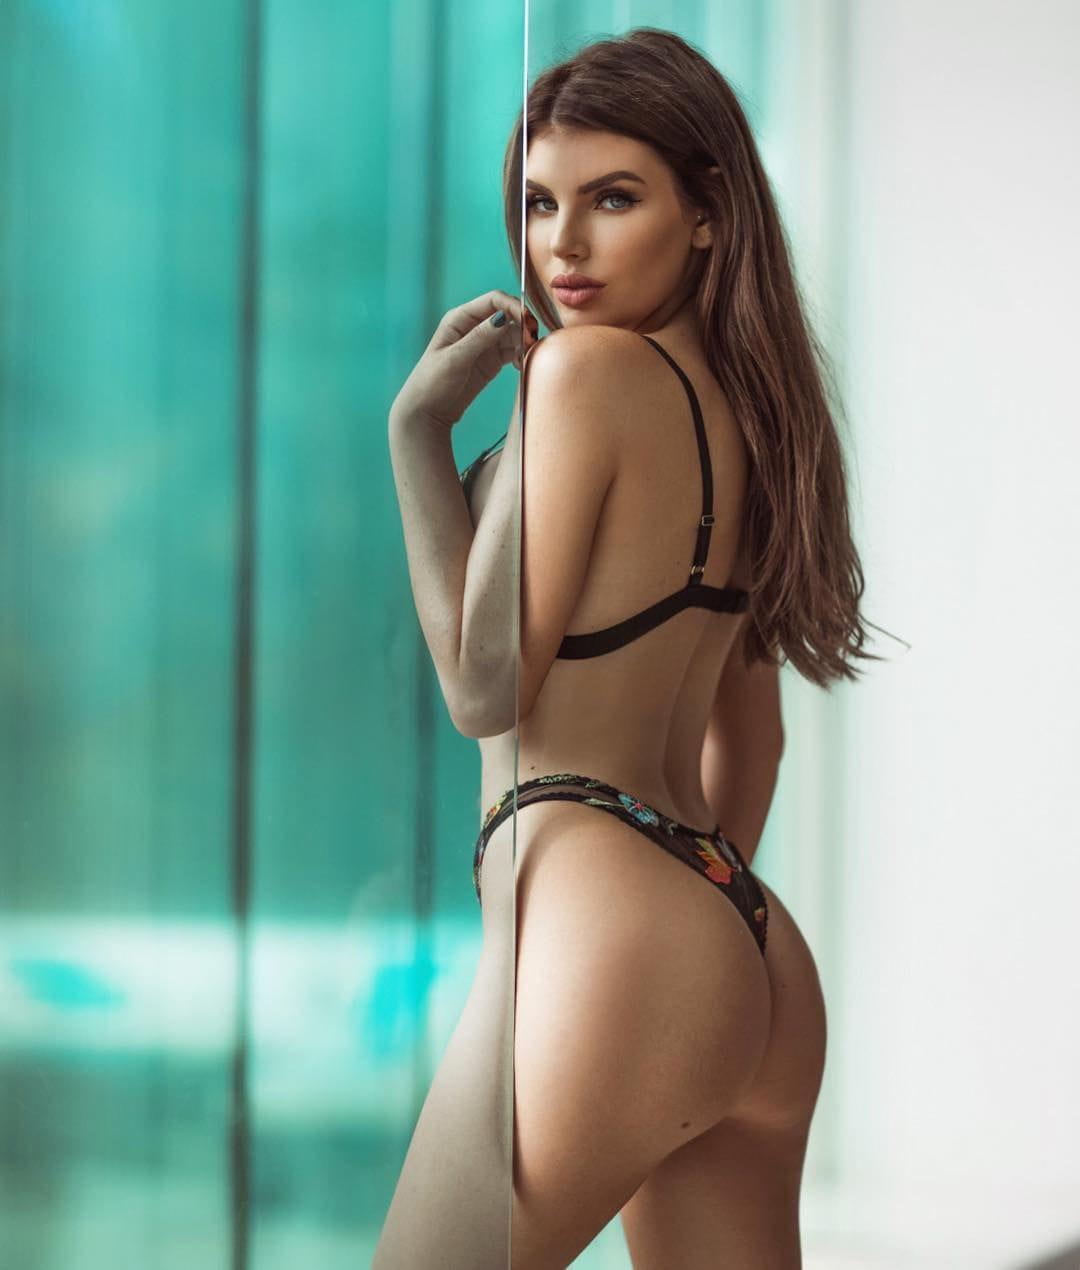 Fotos Nicole Thorne nudes (81 photos), Sexy, Fappening, Feet, bra 2015